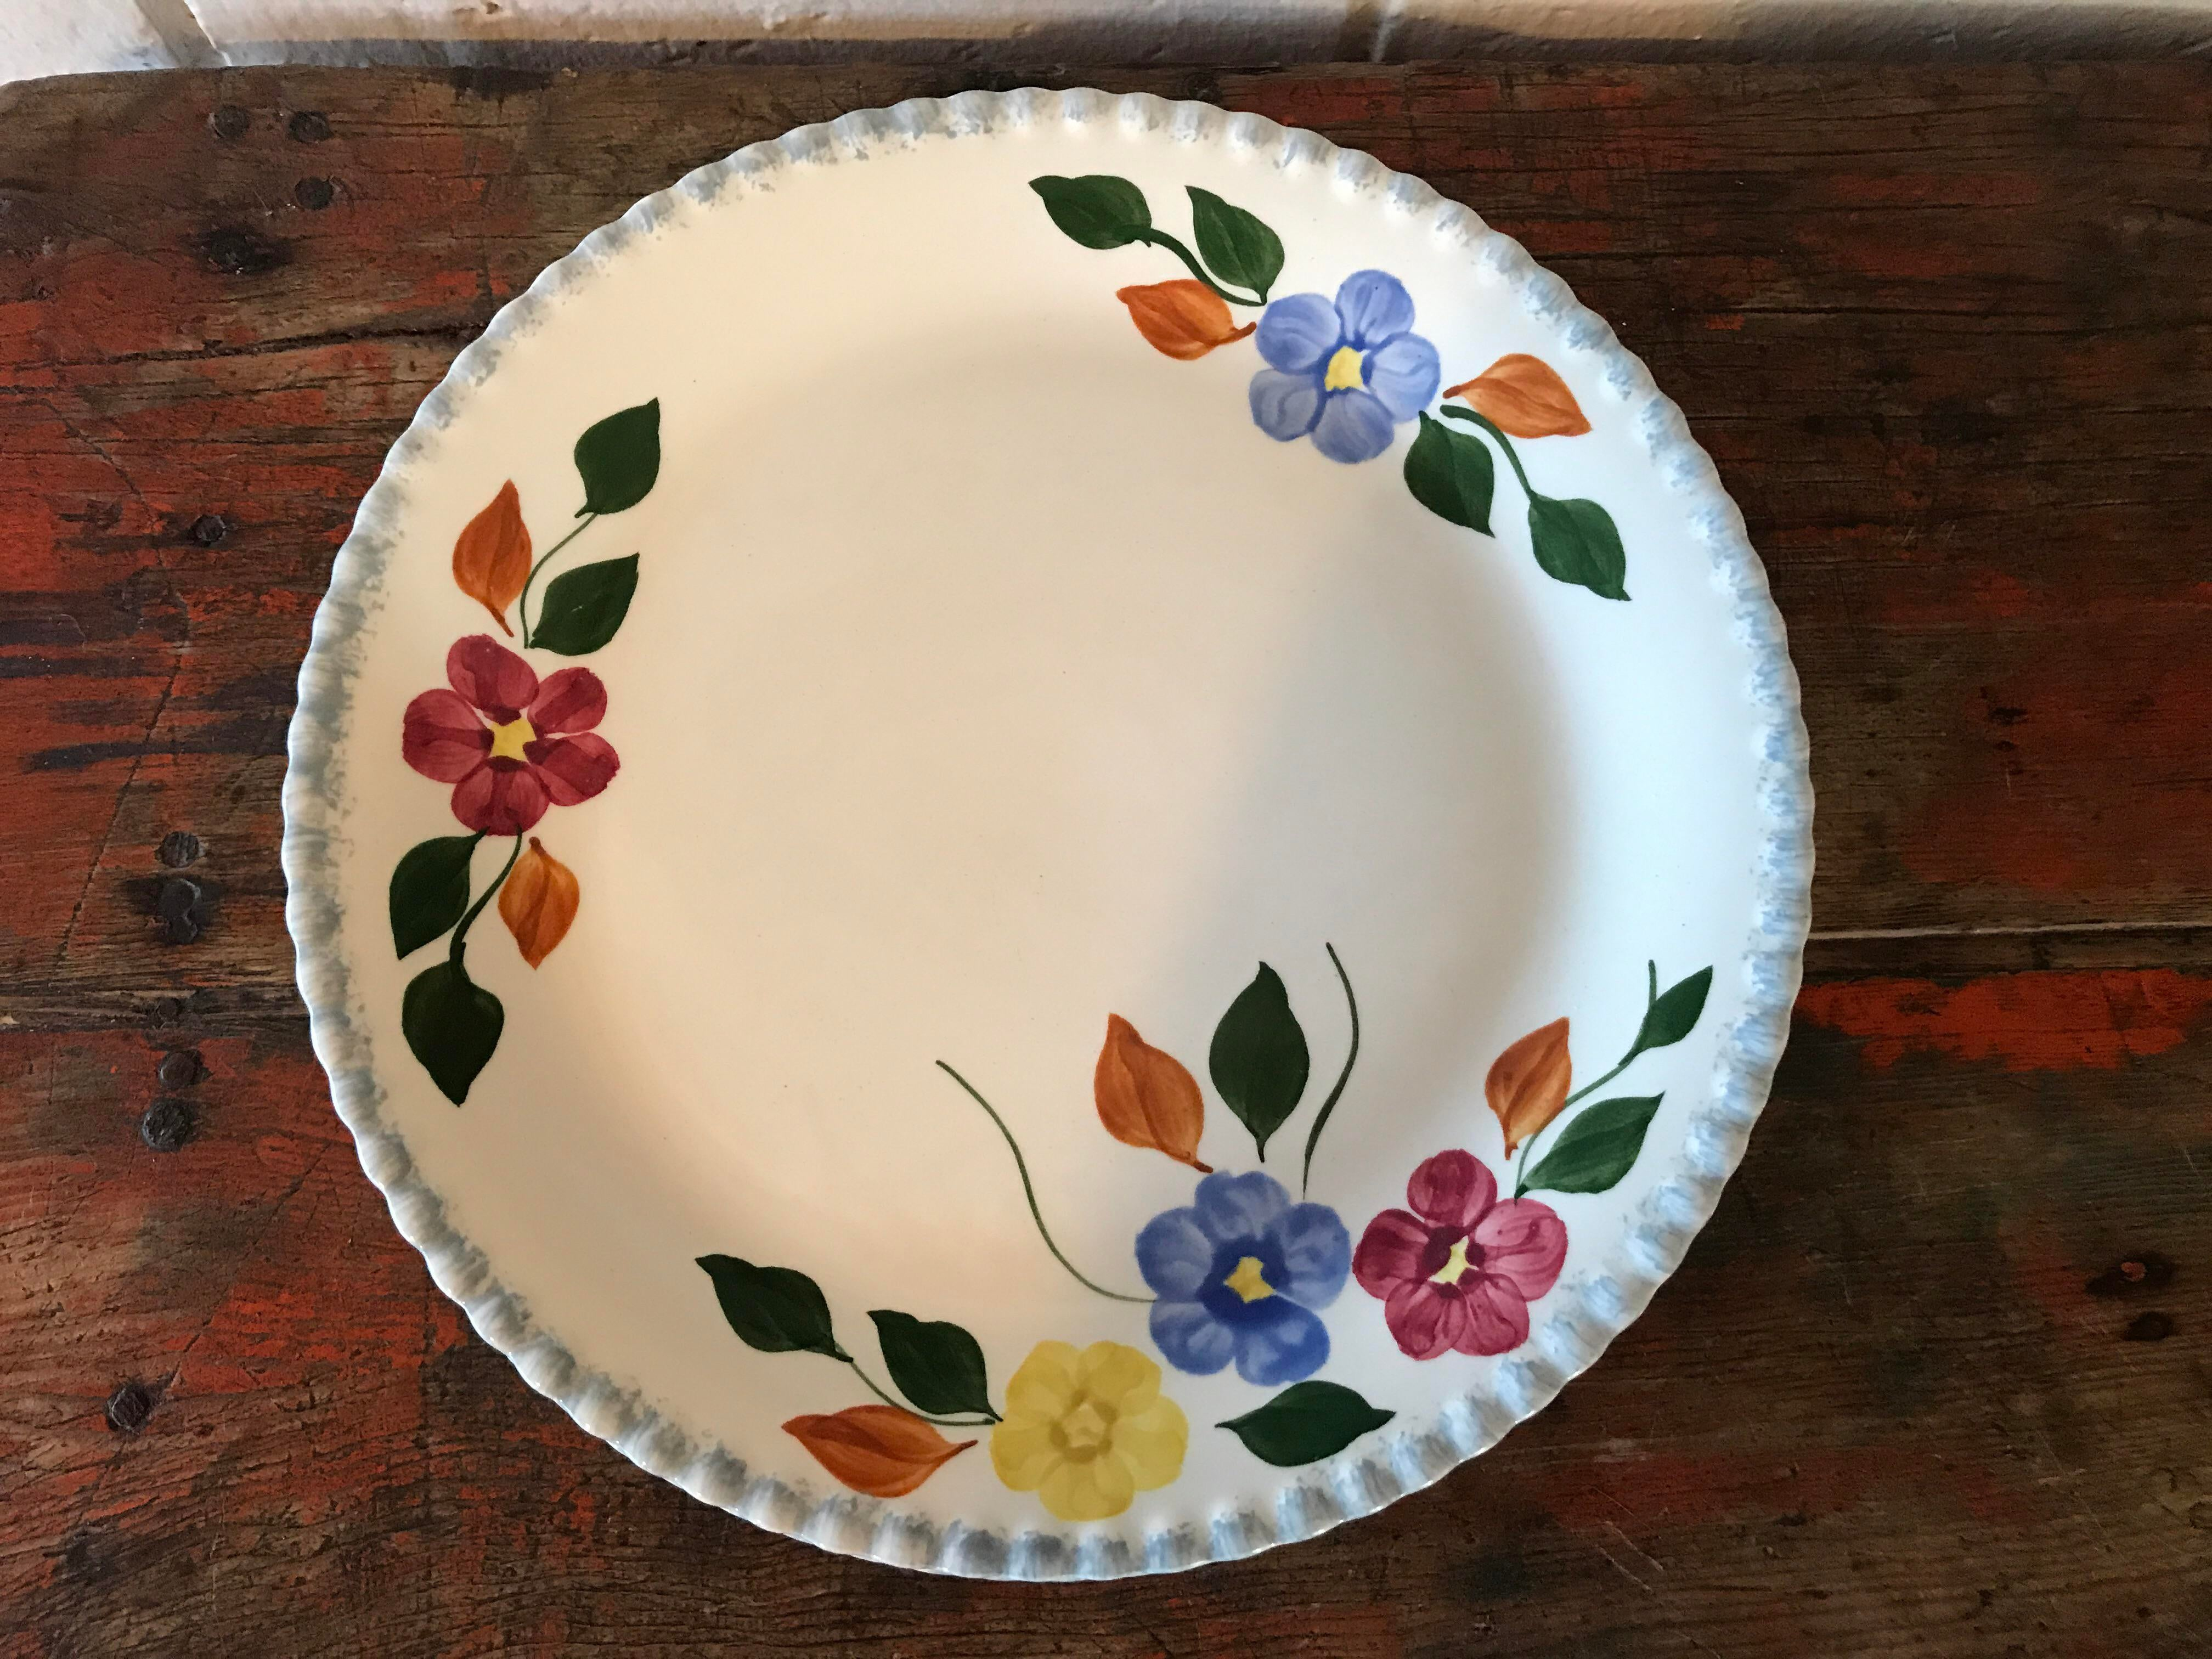 Vintage Hand Painted Dinner Plates - Set of 4 - Image 3 of 8  sc 1 st  Chairish & Vintage Hand Painted Dinner Plates - Set of 4 | Chairish